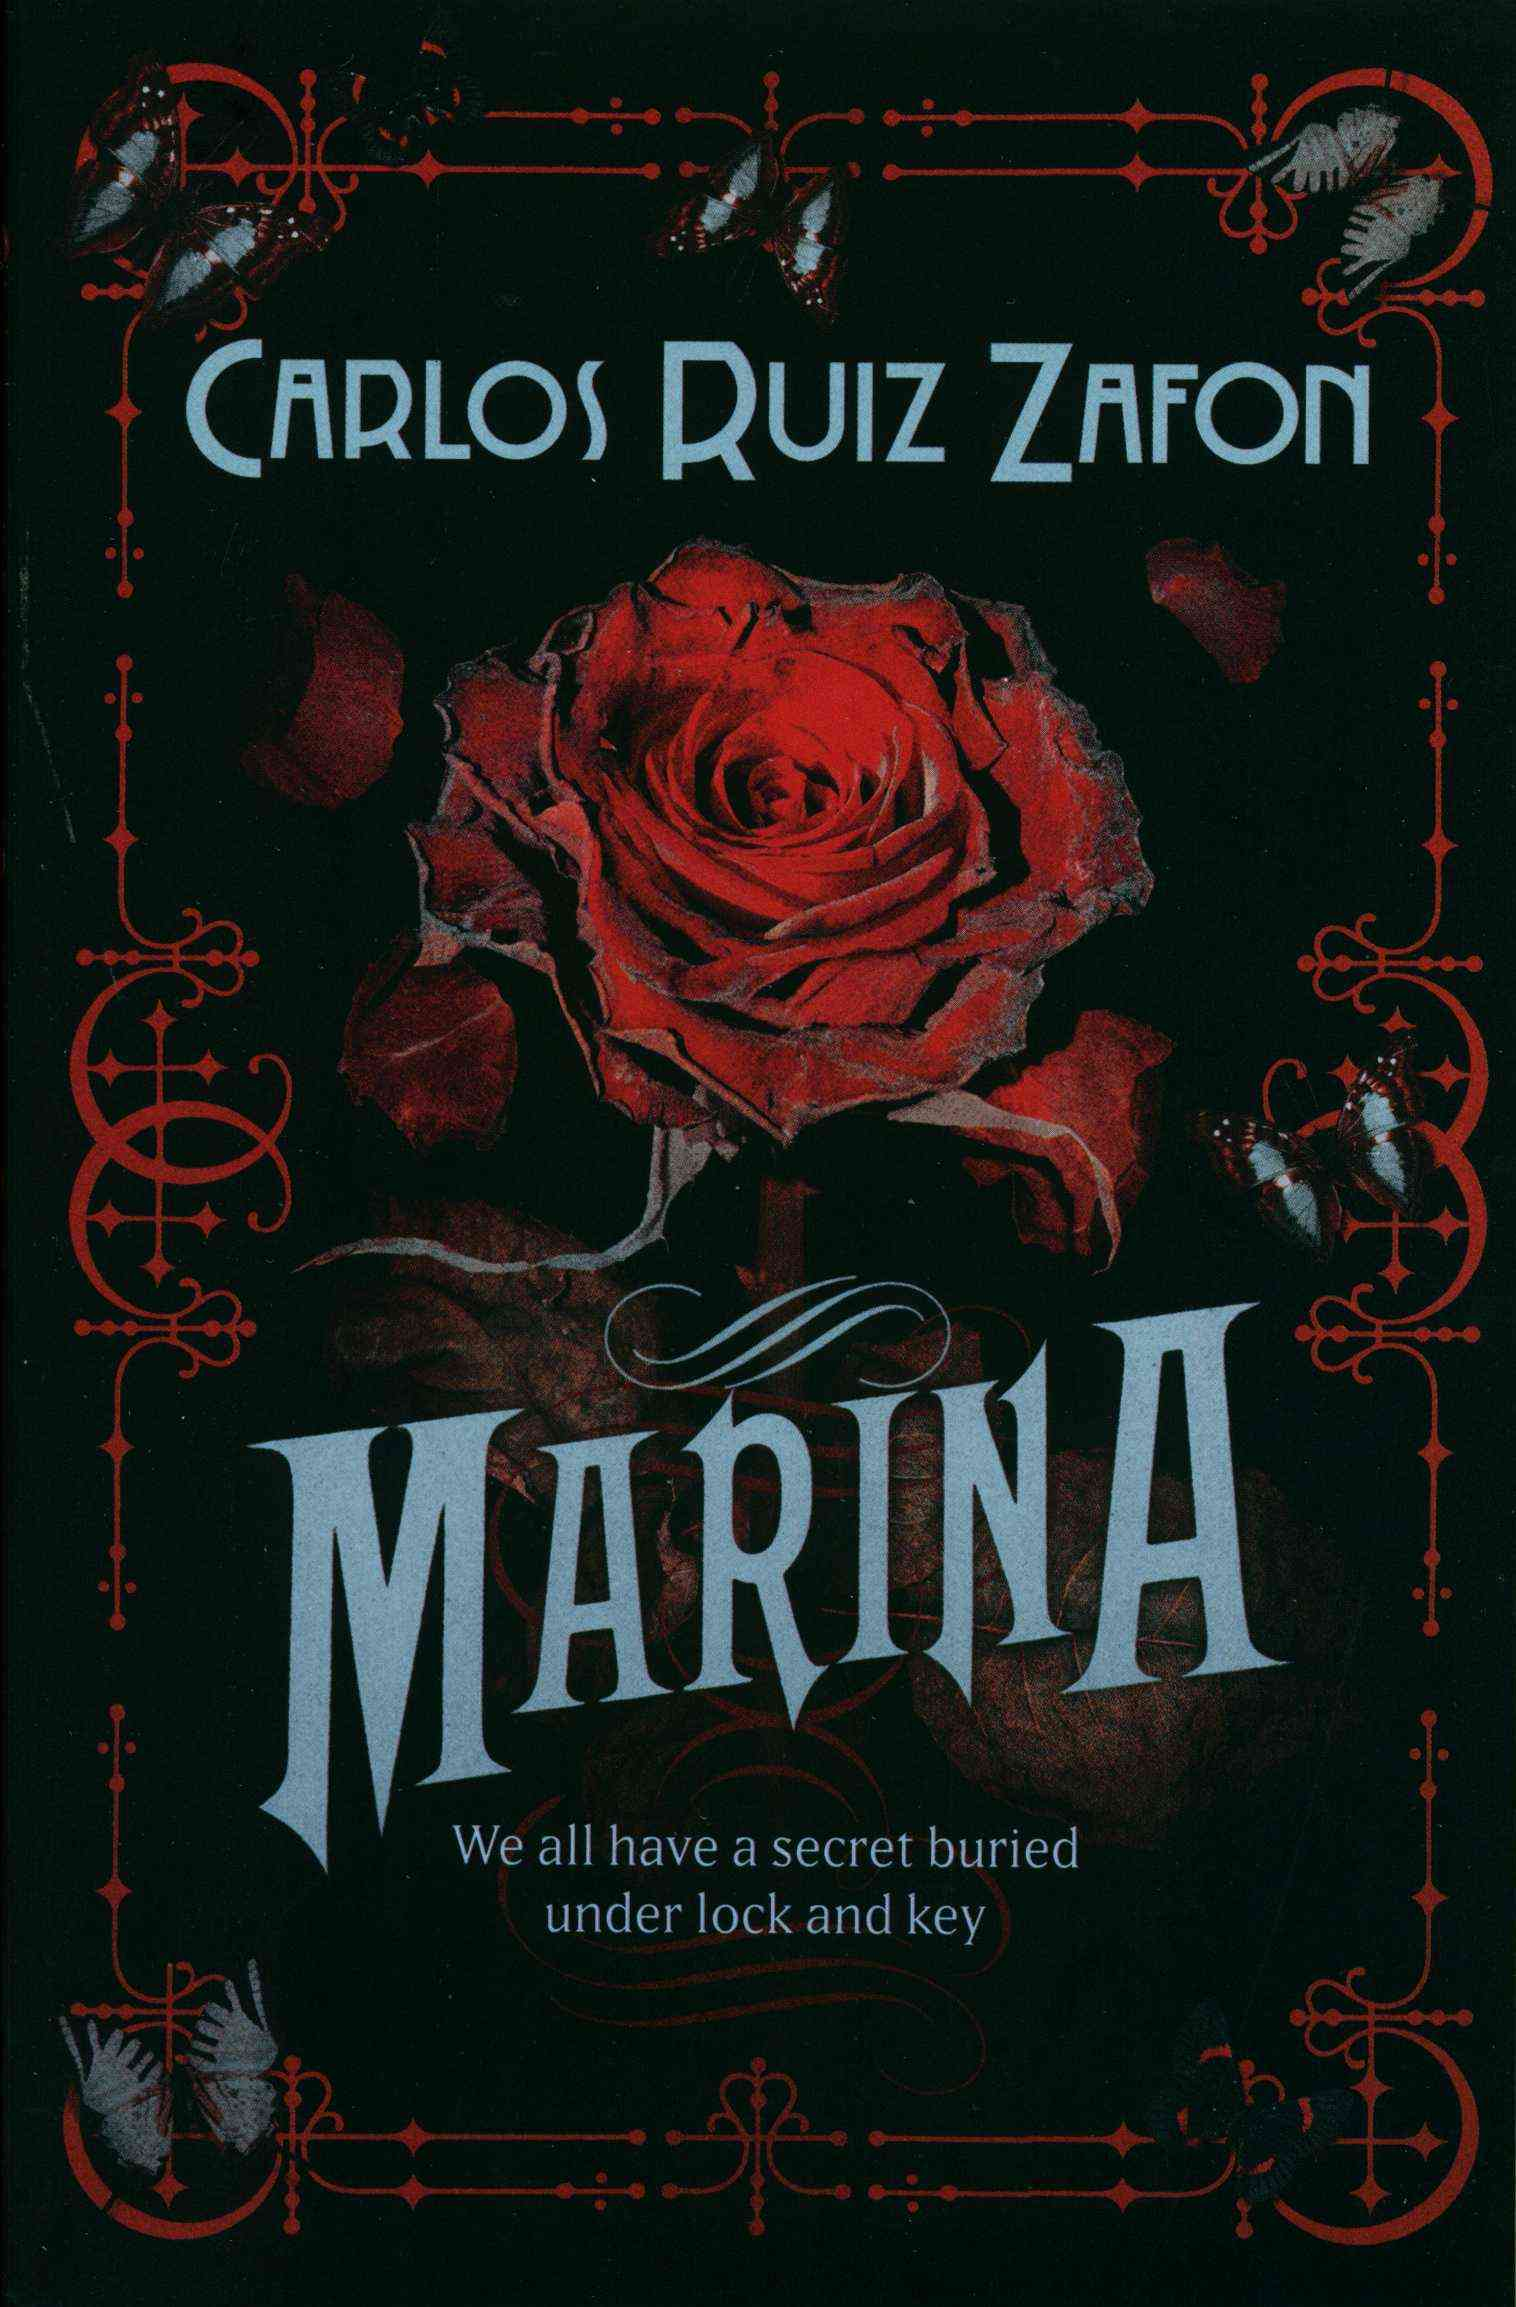 marina-carlos-ruiz-zafon-9781780224268.jpg